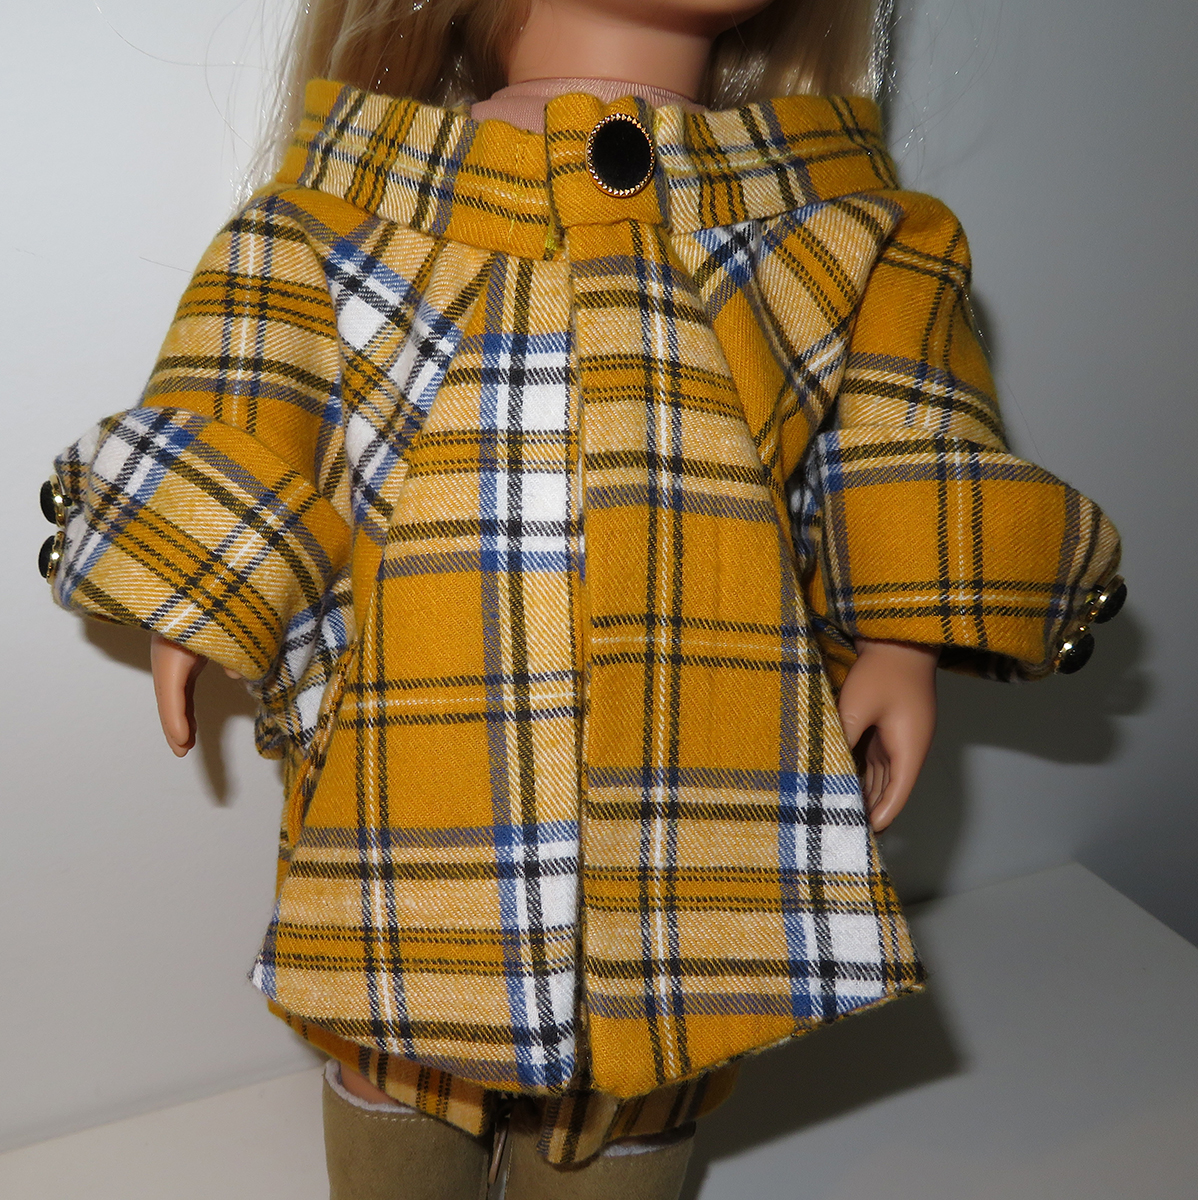 Scottish tartan Dress and coat - Made by Lolo